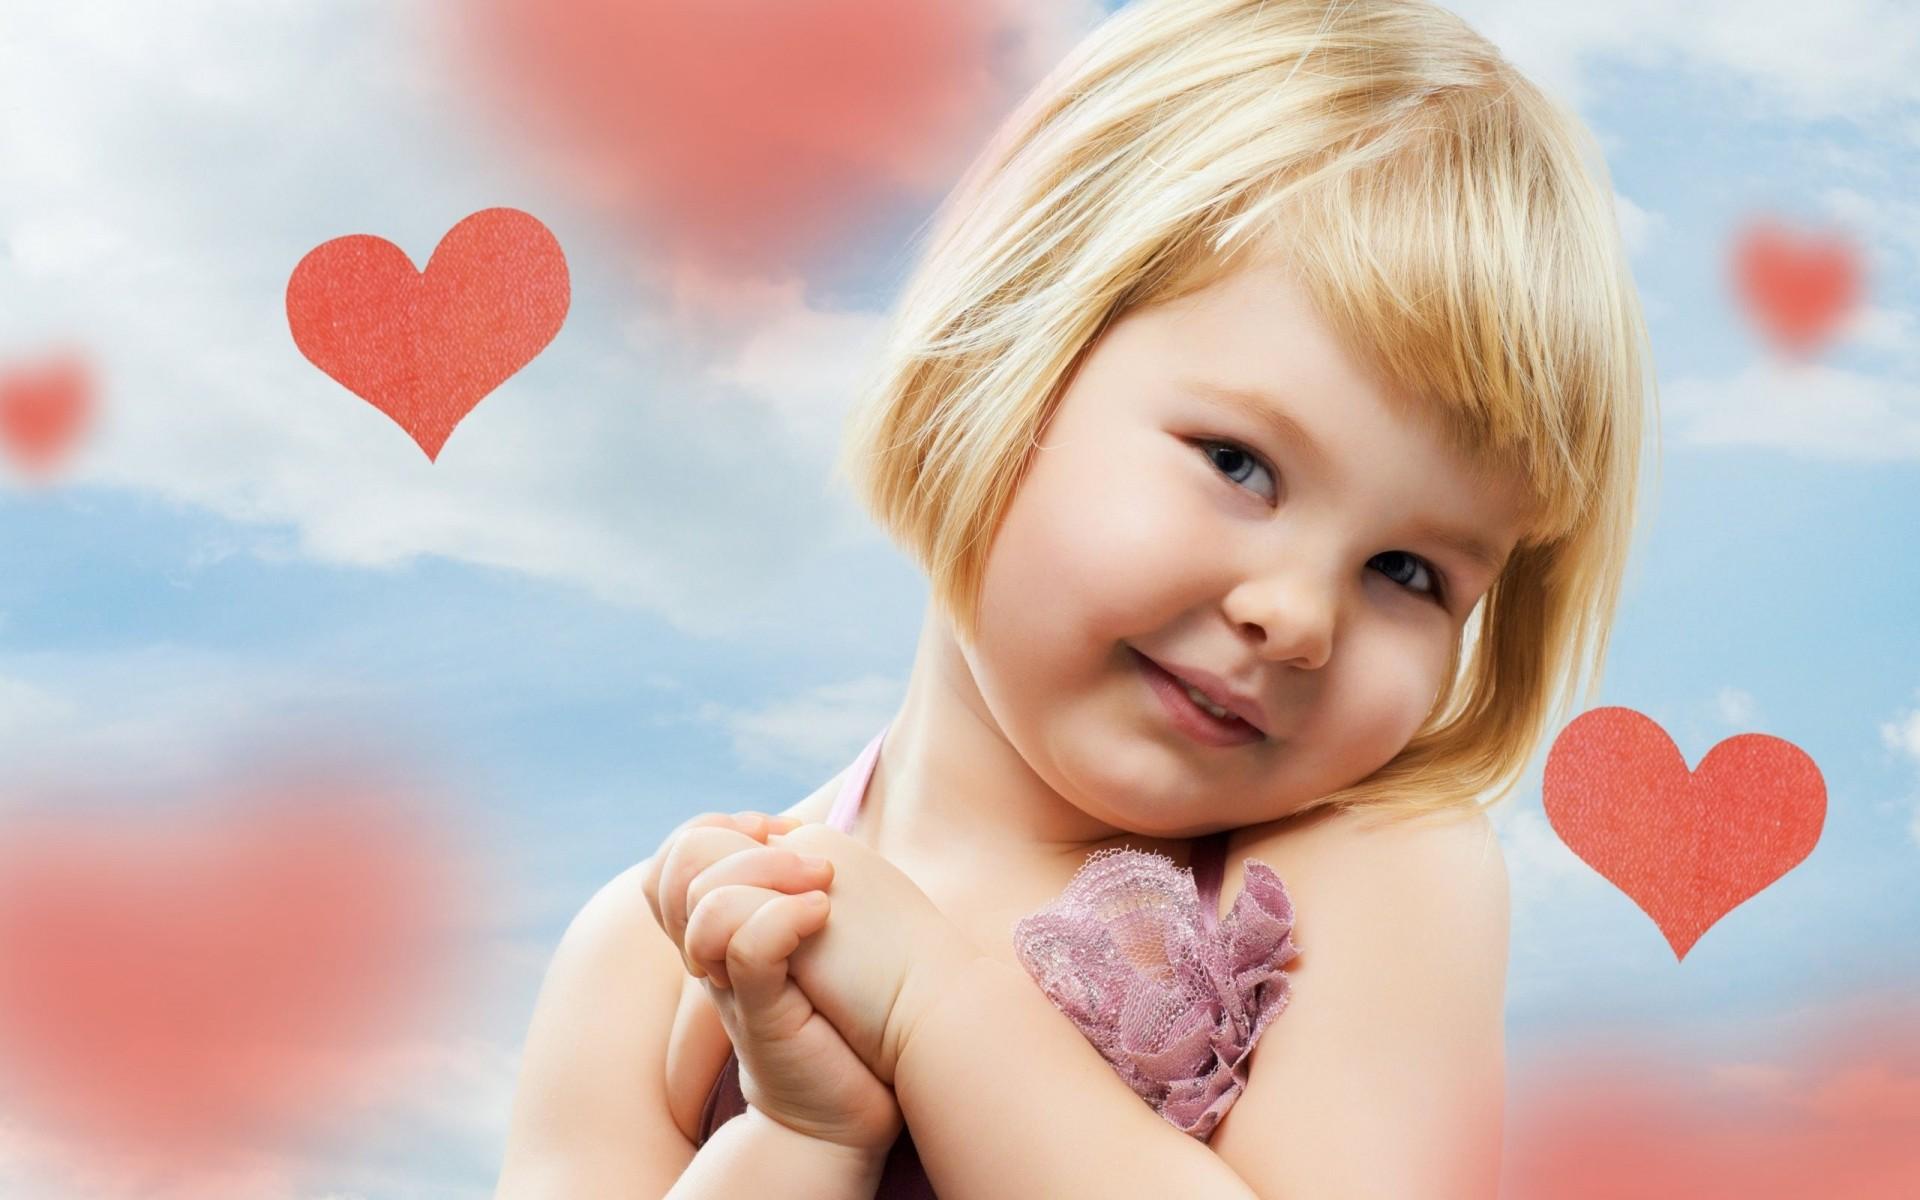 для детей картинки сердечки